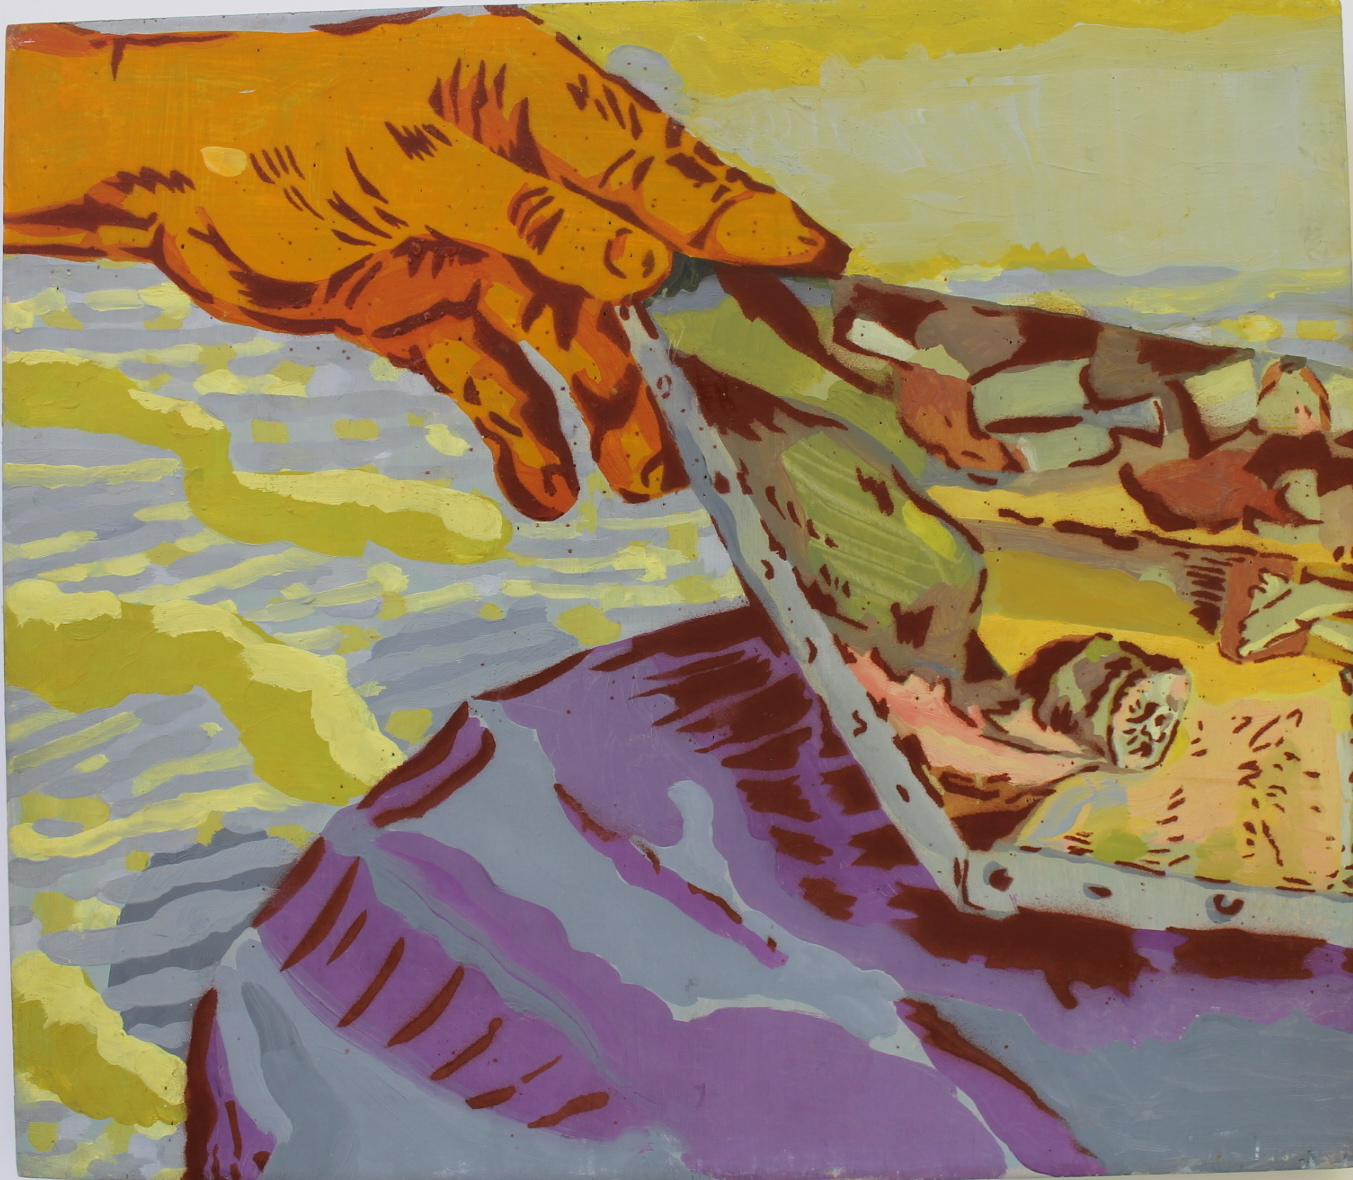 "Dennis Congdon  Maestro,  2012   Oil and enamel on birch panel   12"" x 14""   Retail Value: $500   Opening Bid: $200"